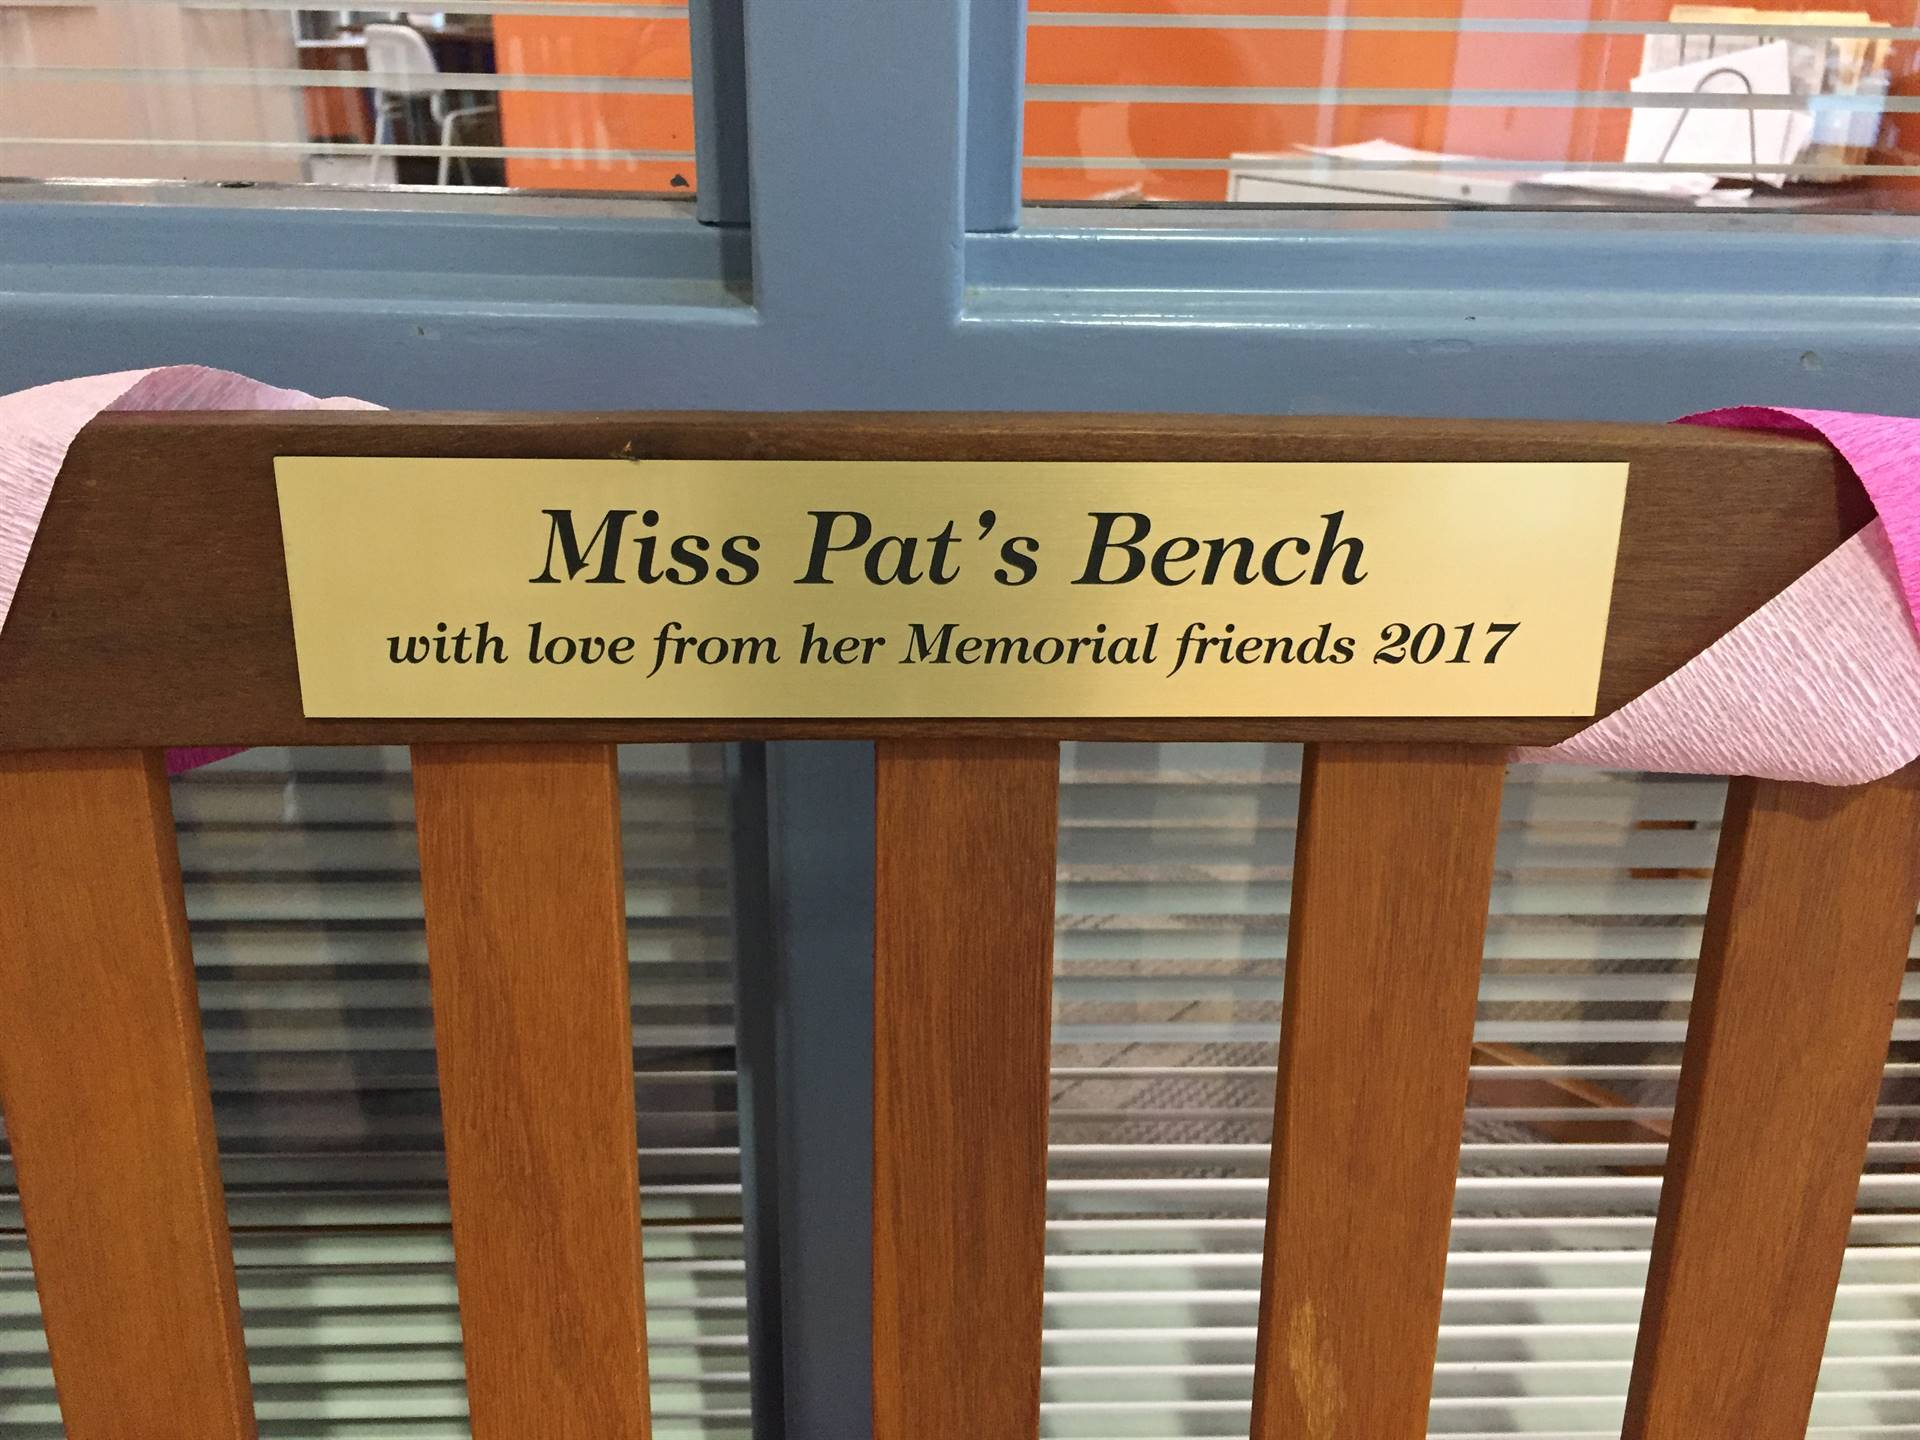 Miss Pat's Bench